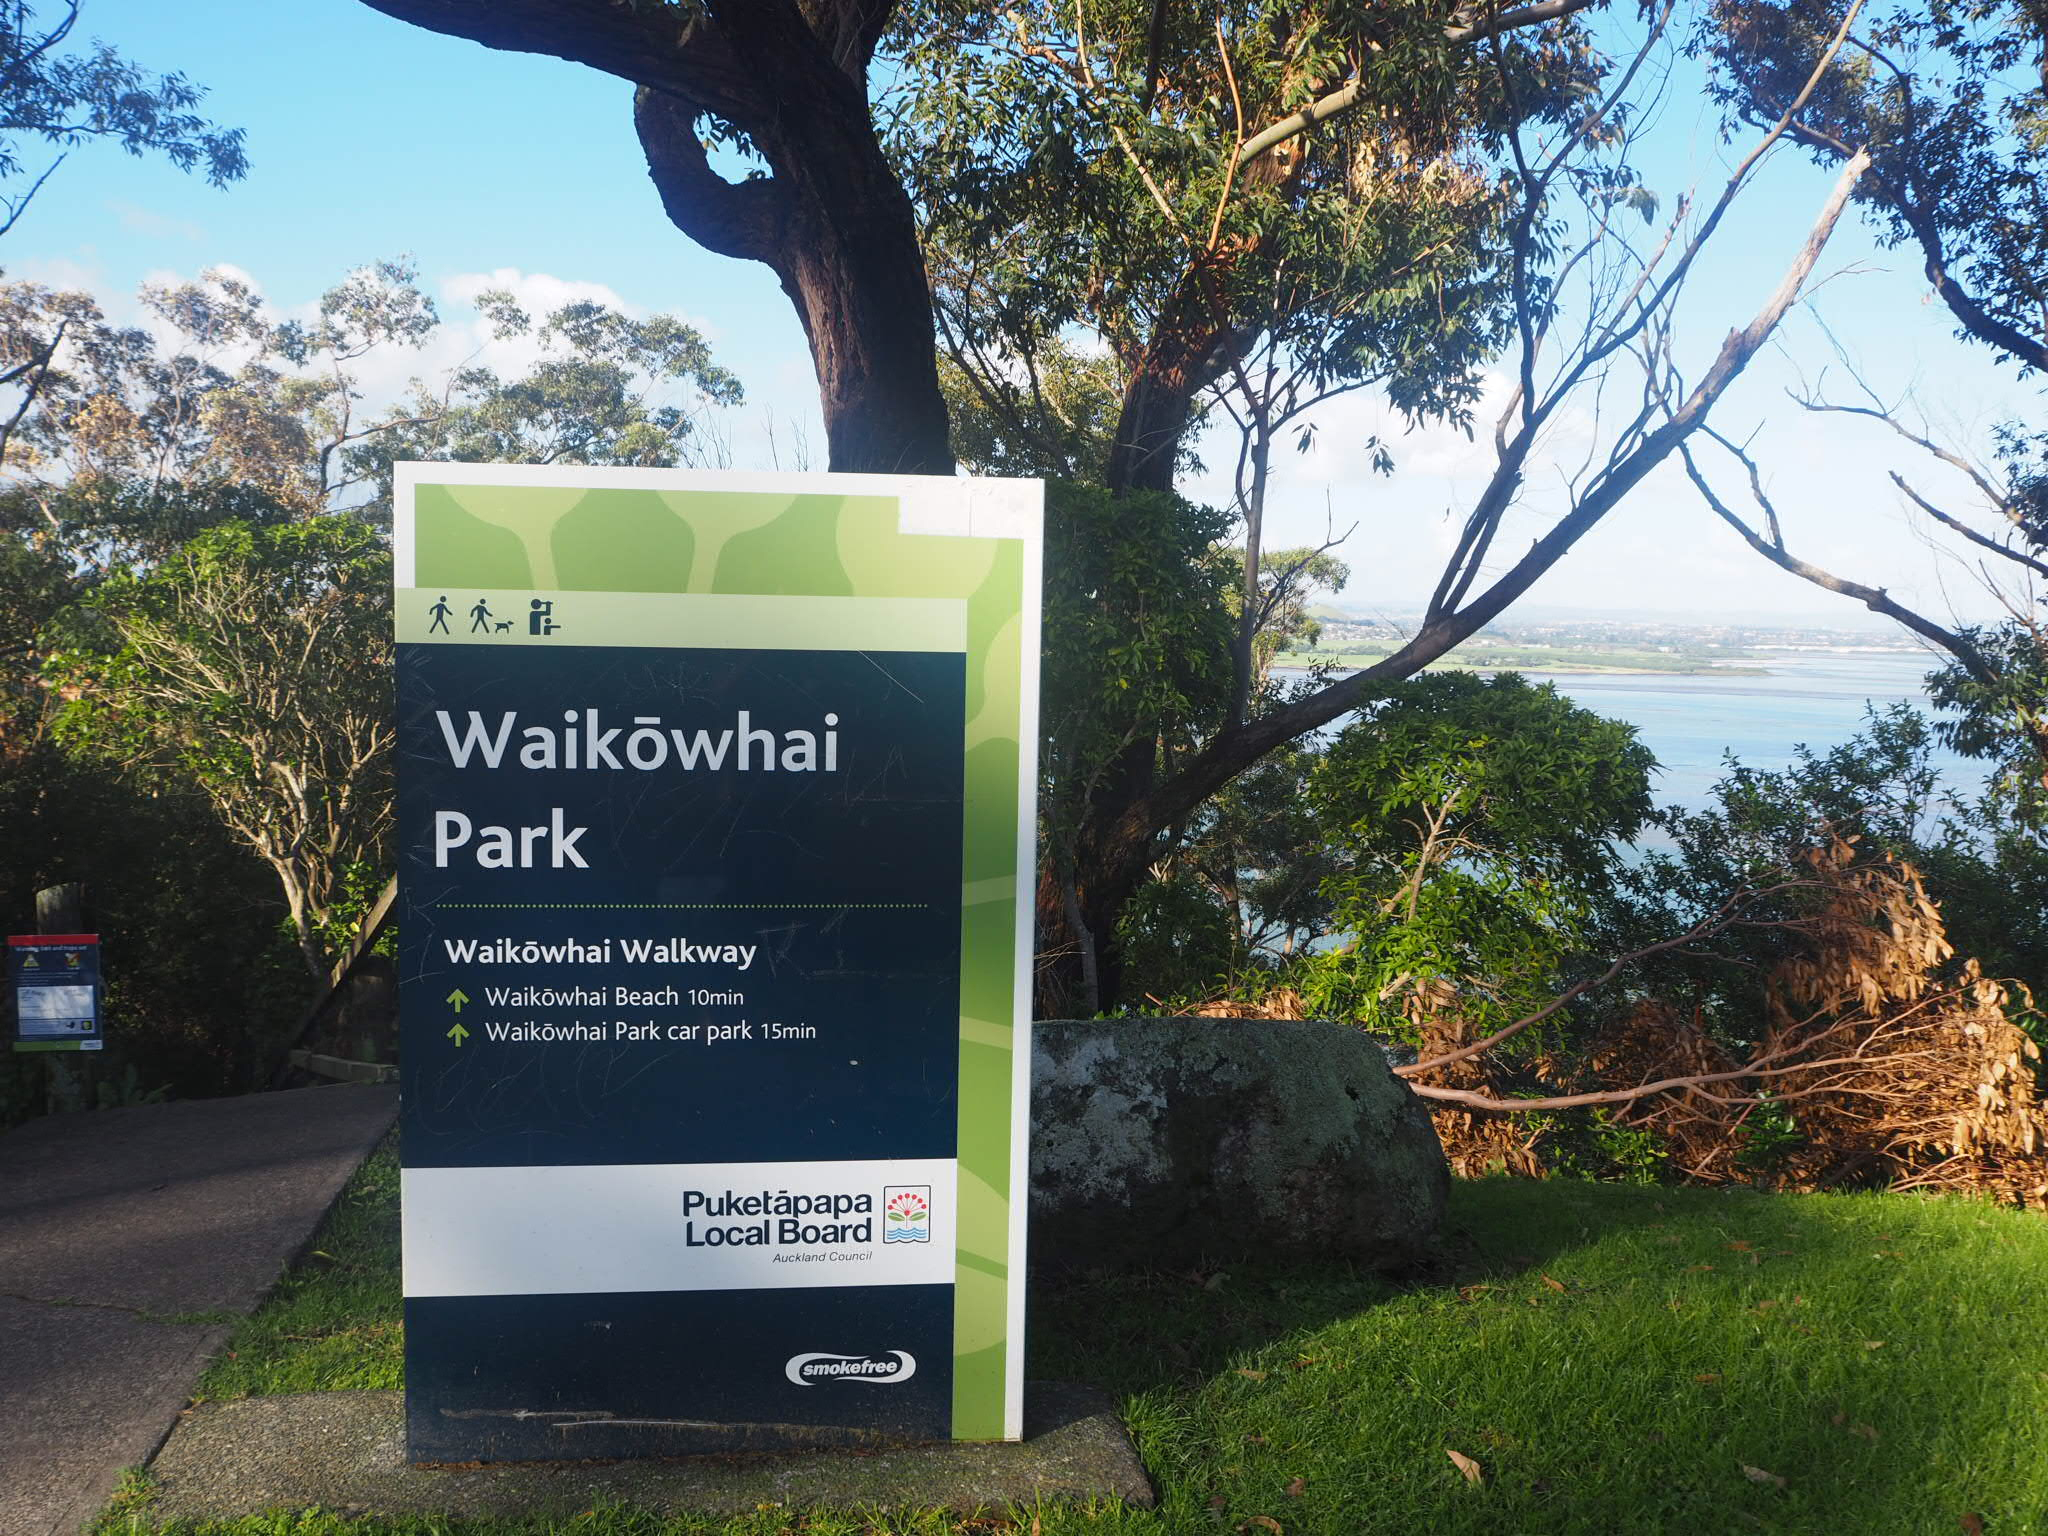 Waikowhai Walkway, Auckland